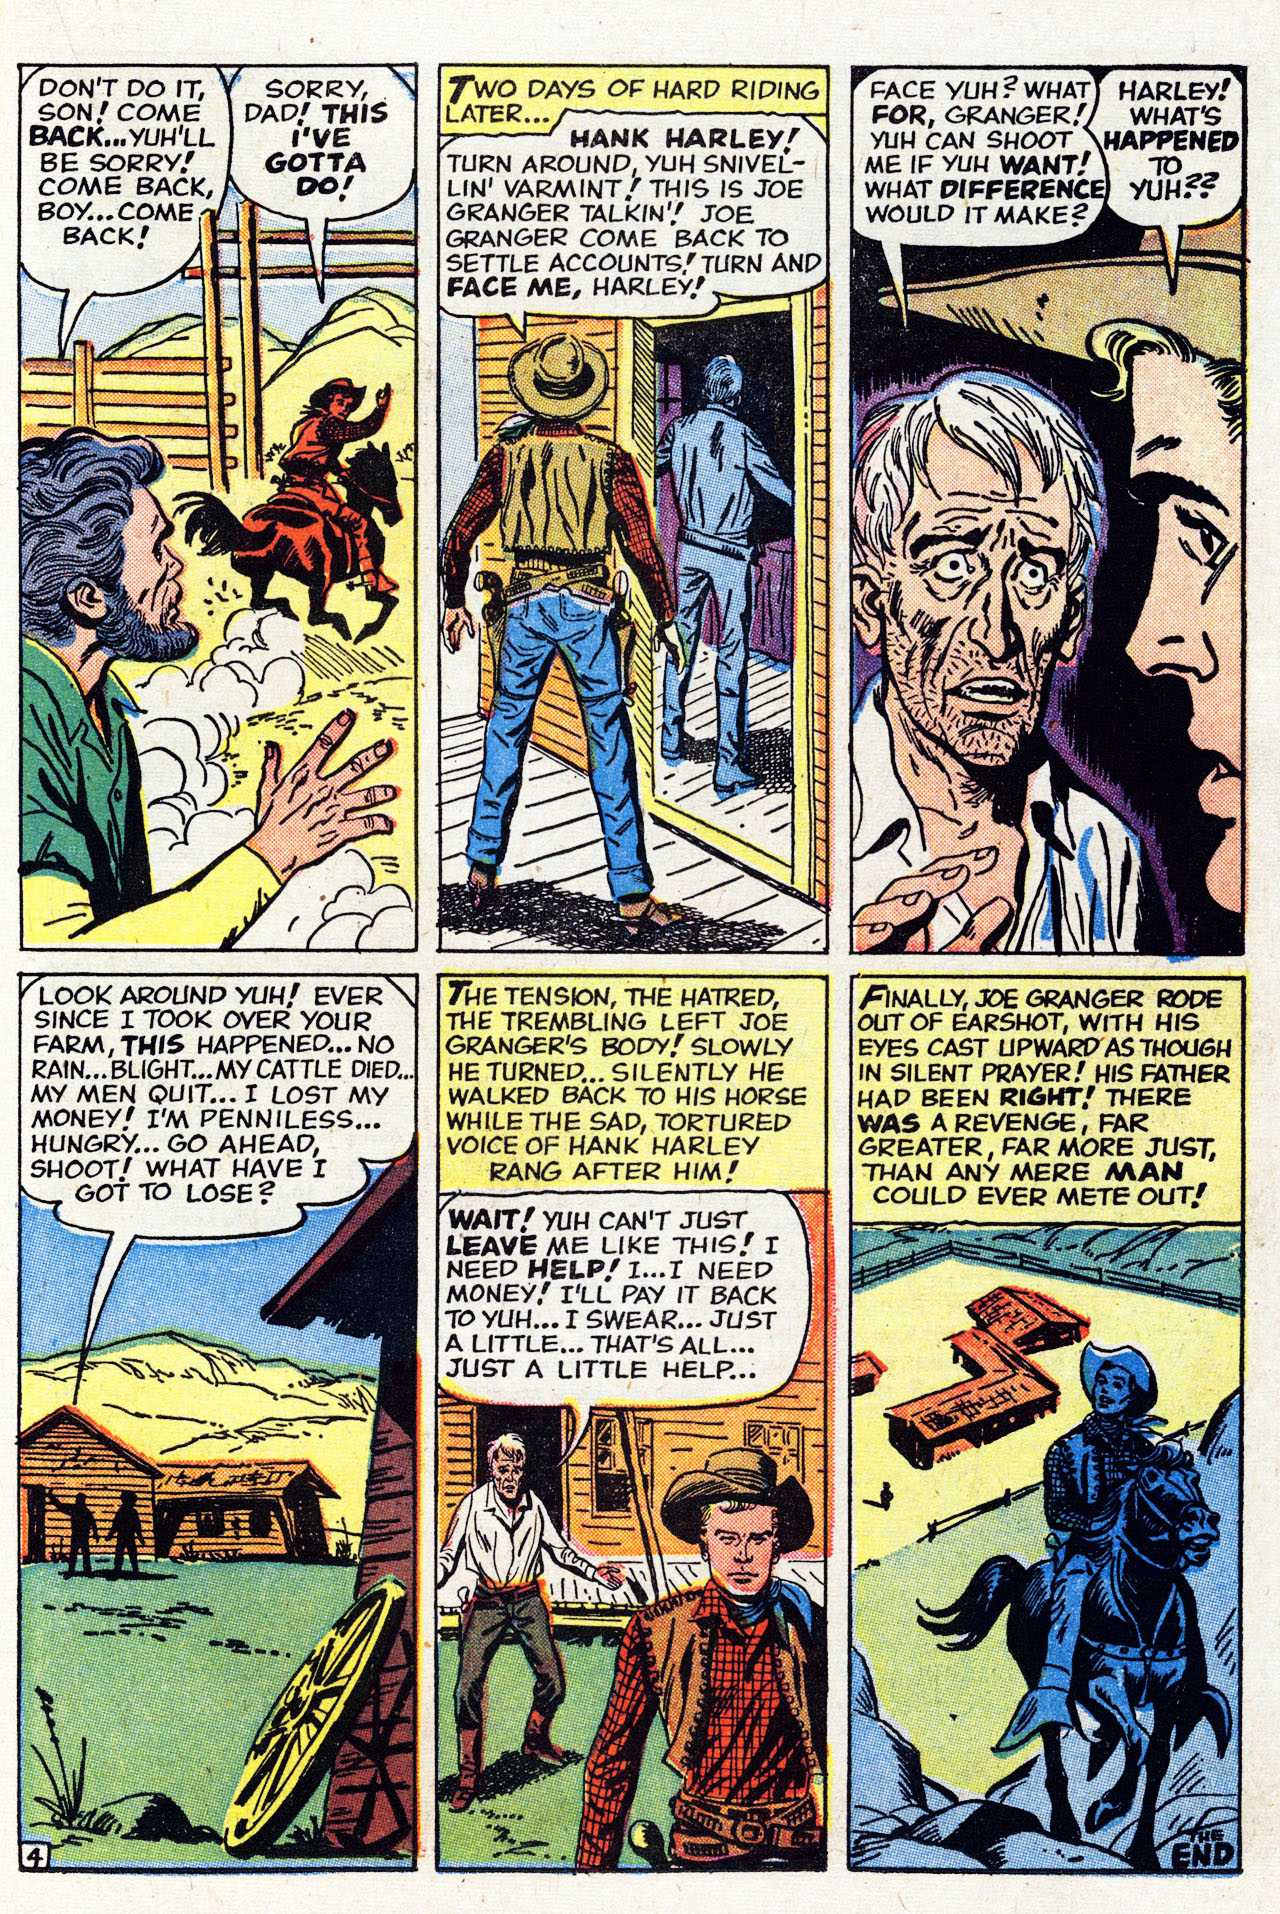 Read online Two-Gun Kid comic -  Issue #53 - 23